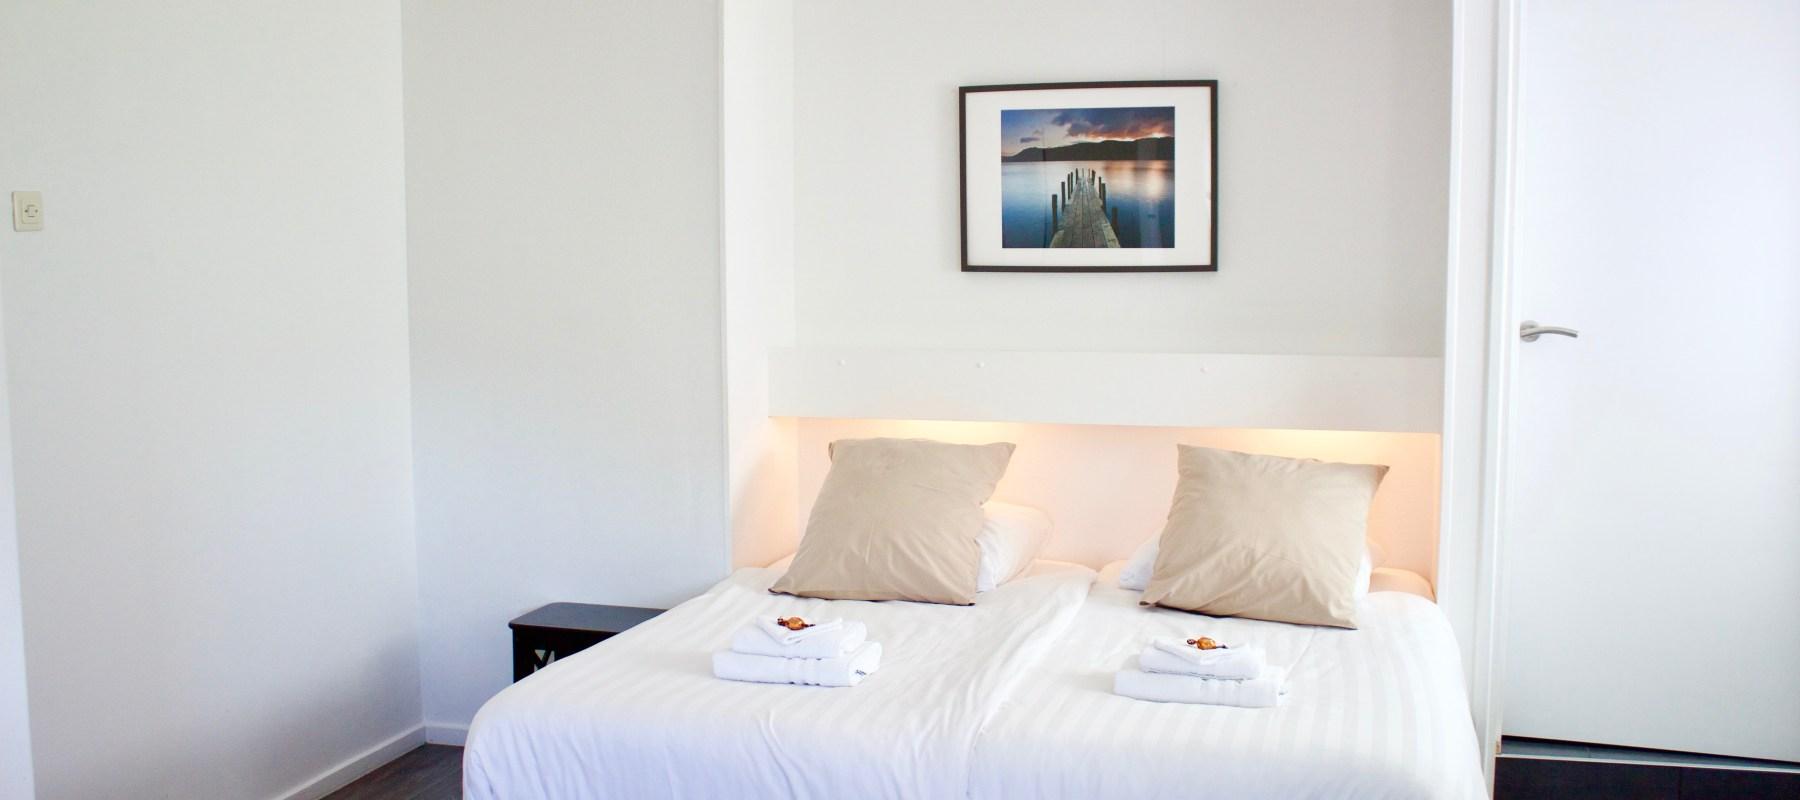 Ruime kamers met- en zonder balkon